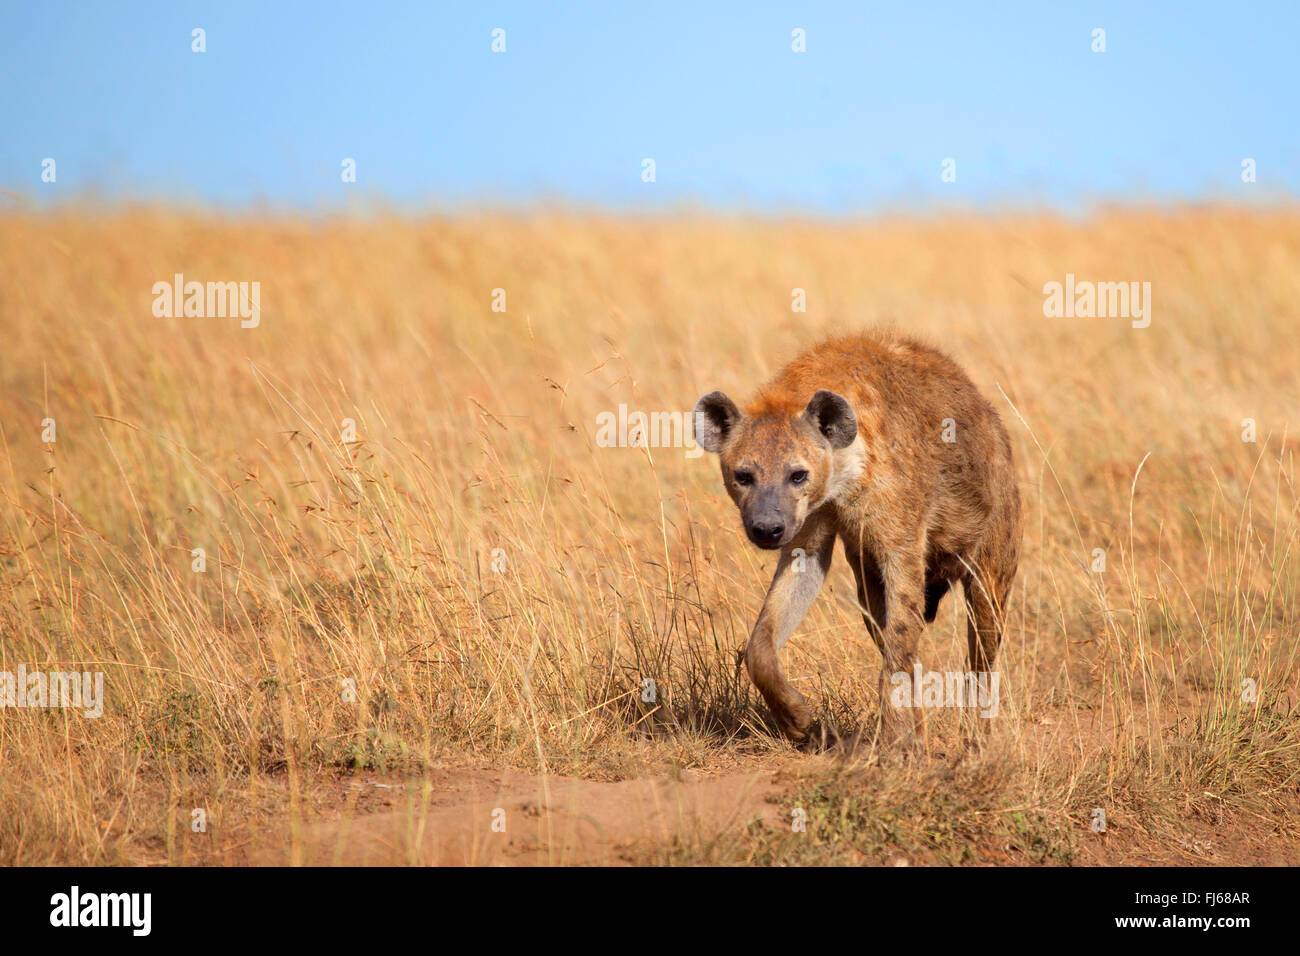 Gefleckte Hyänen (Crocuta Crocuta), Spaziergänge in Savanne, Kenia, Masai Mara Nationalpark Stockbild